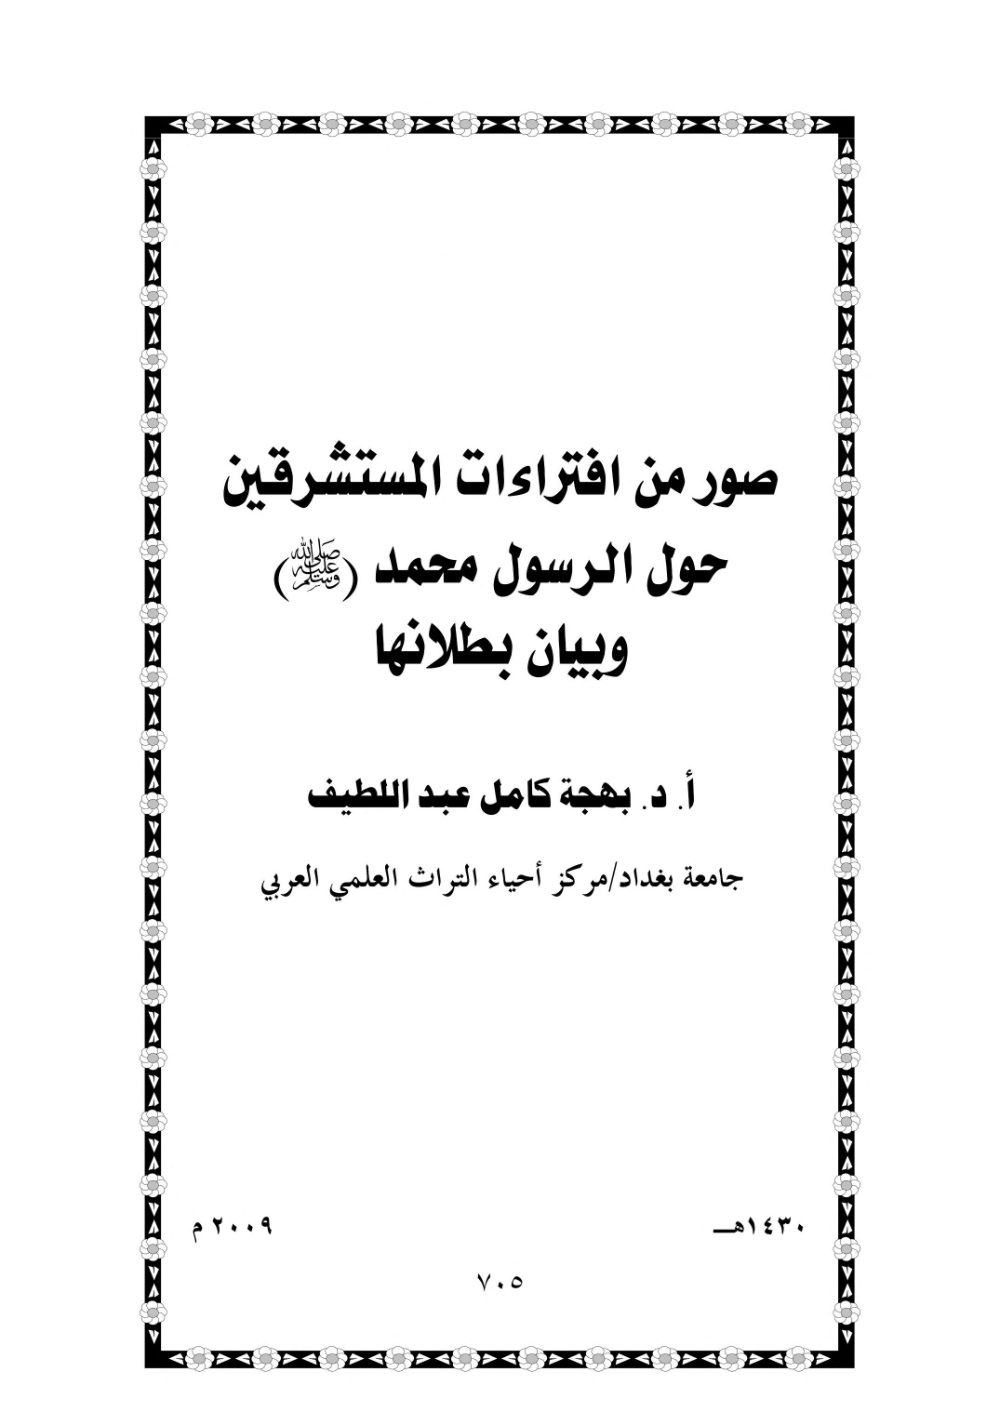 صور من افتراءات المستشرقين حول الرسول محمد Amgad Free Download Borrow And Streaming Internet Archive Pdf Books Reading Internet Archive Reading